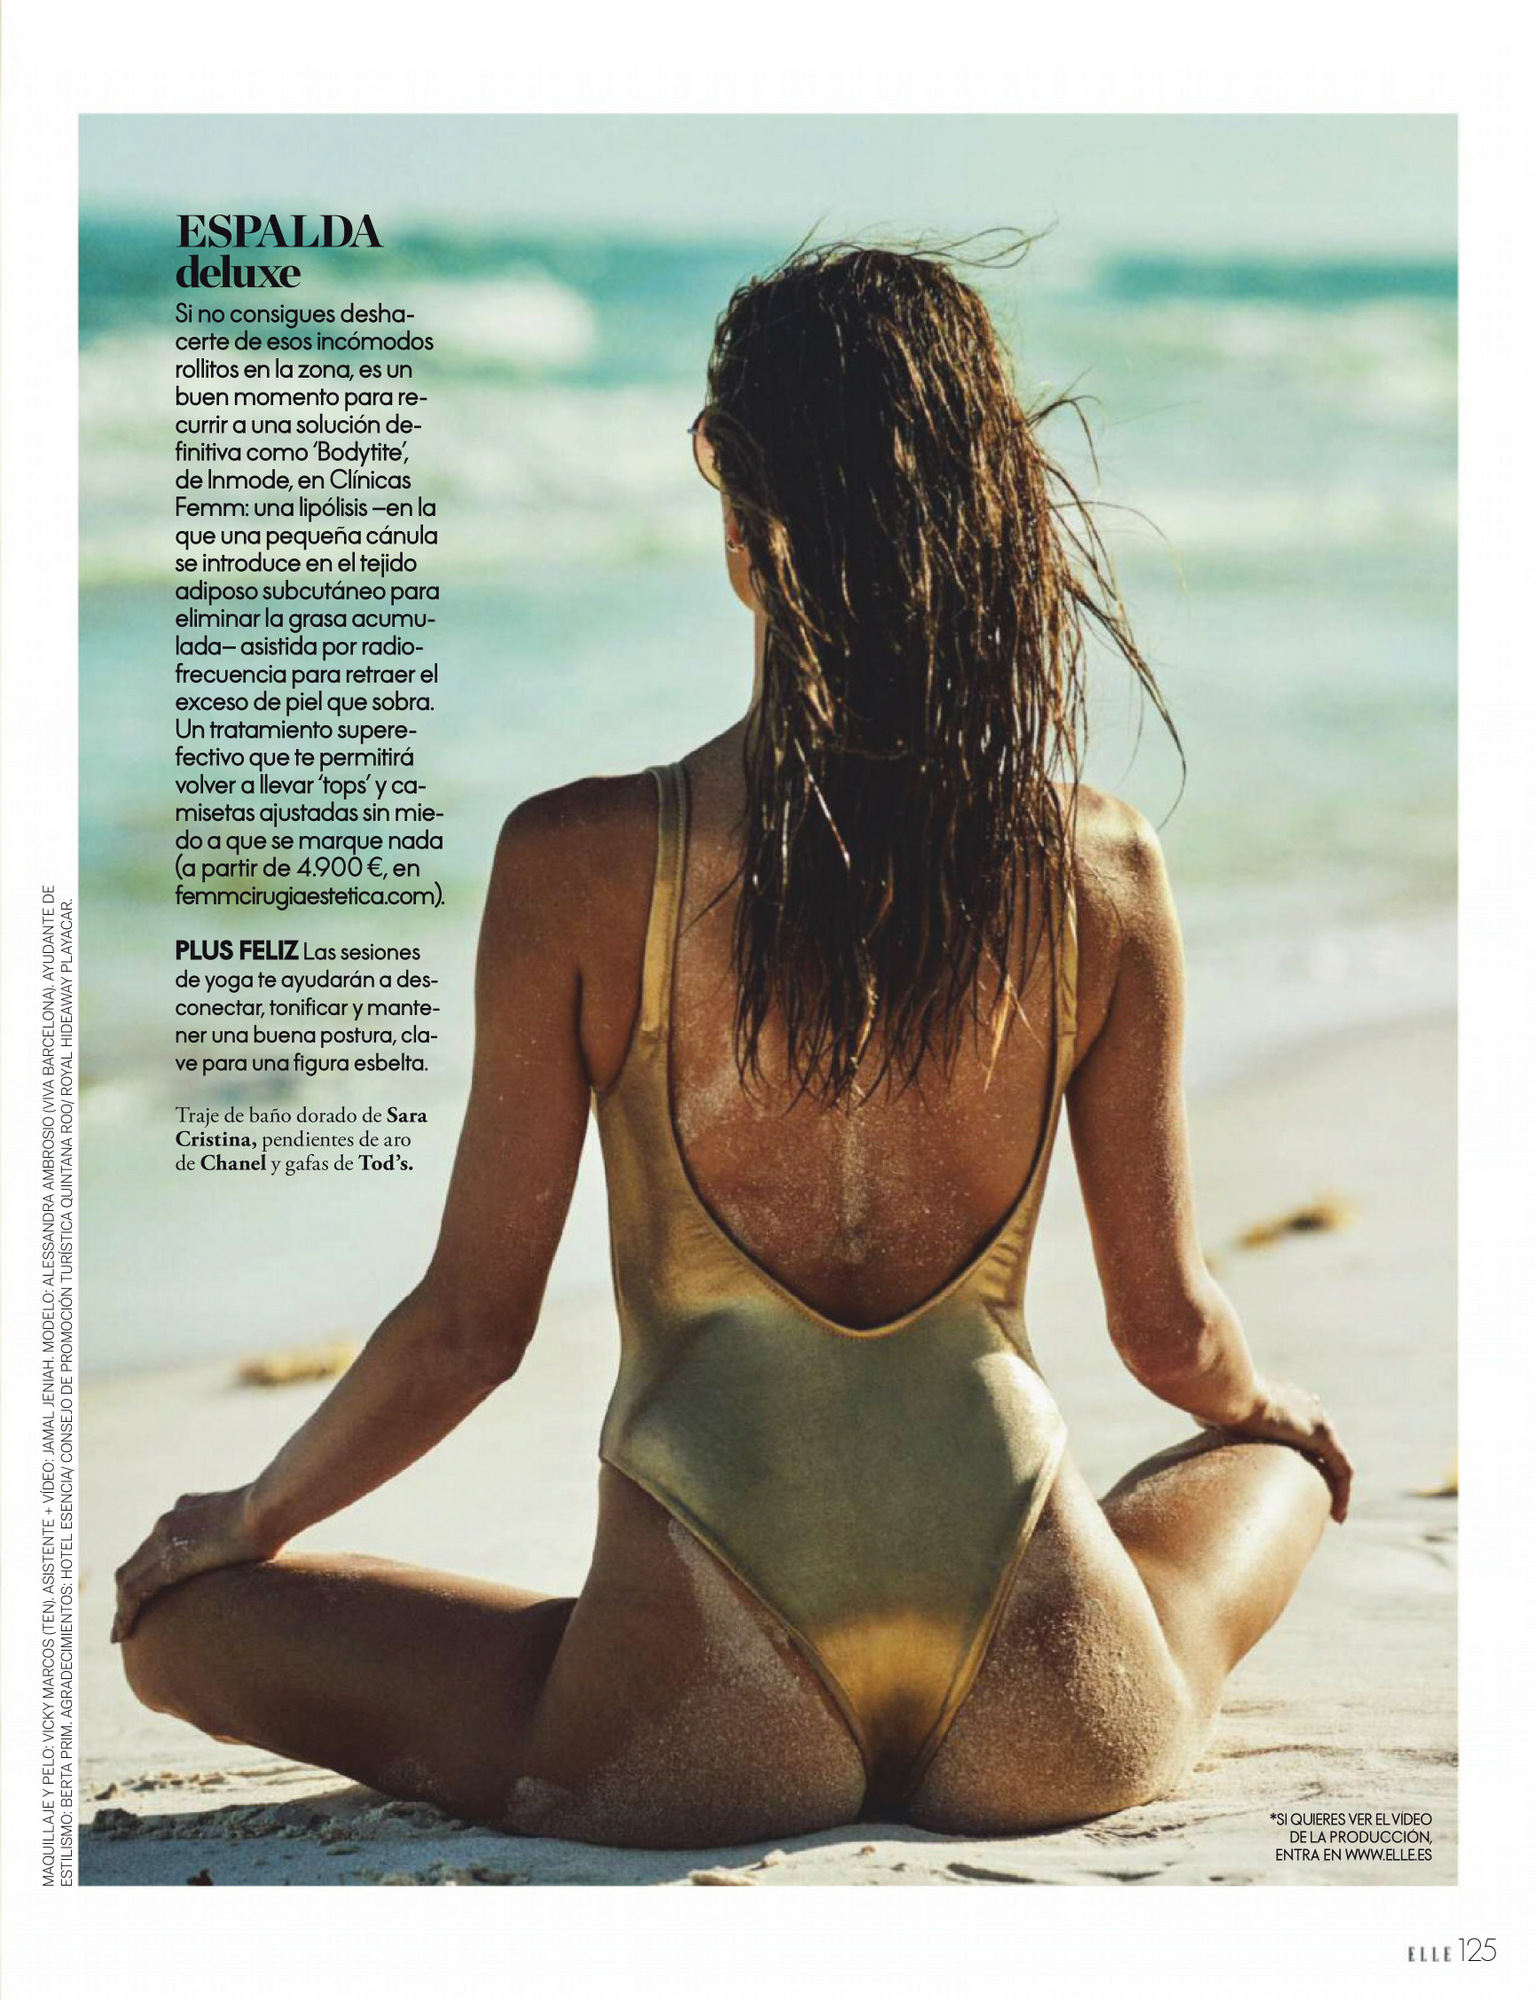 Alessandra Ambrosio – Beautiful Boobs In Sexy Photoshoot For Elle Spain Magazine (june 2020) 0012